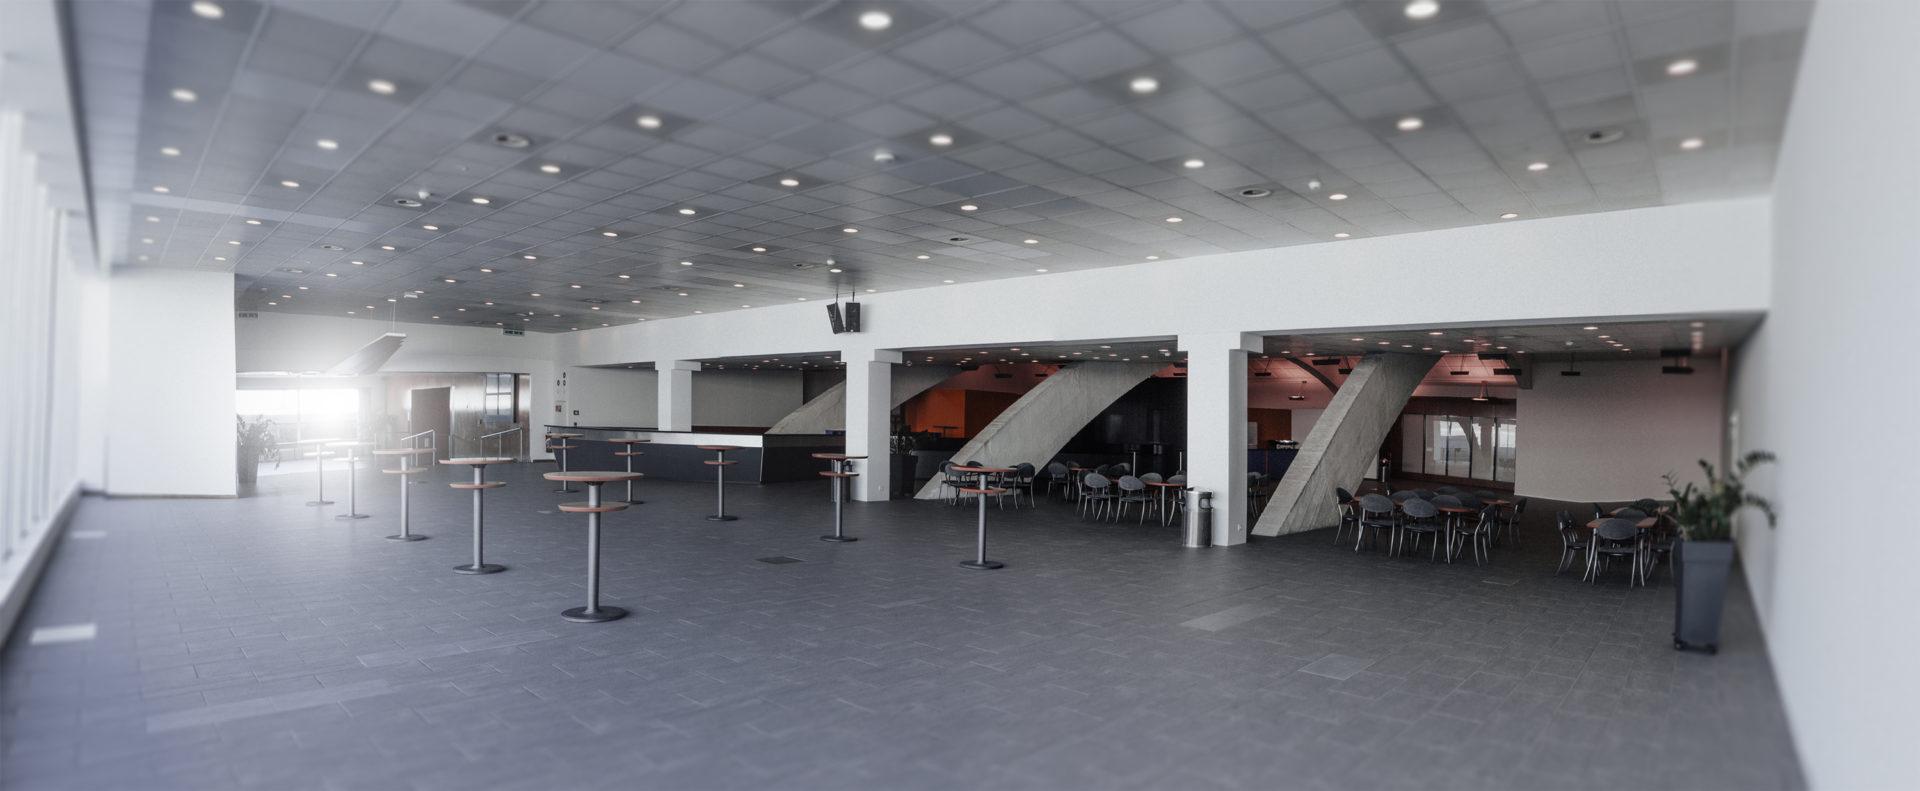 Foyer_H3